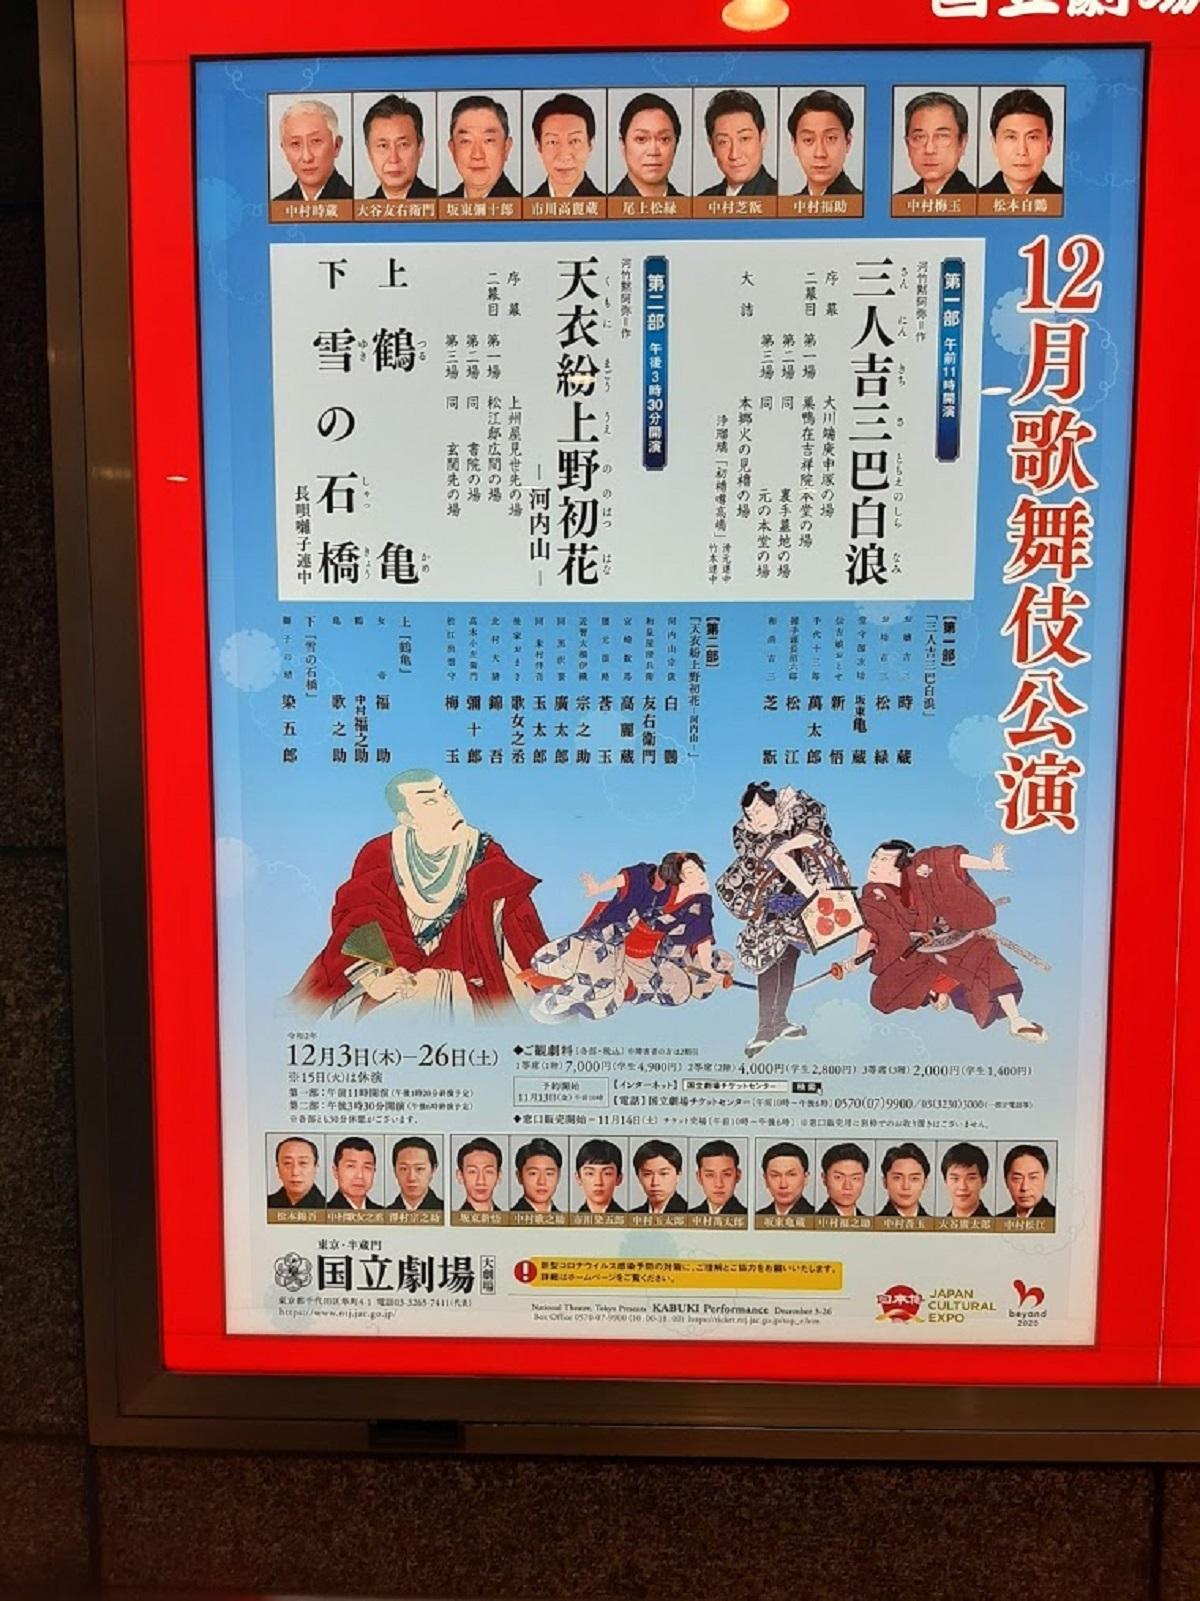 国立劇場歌舞伎公演12月ポスター